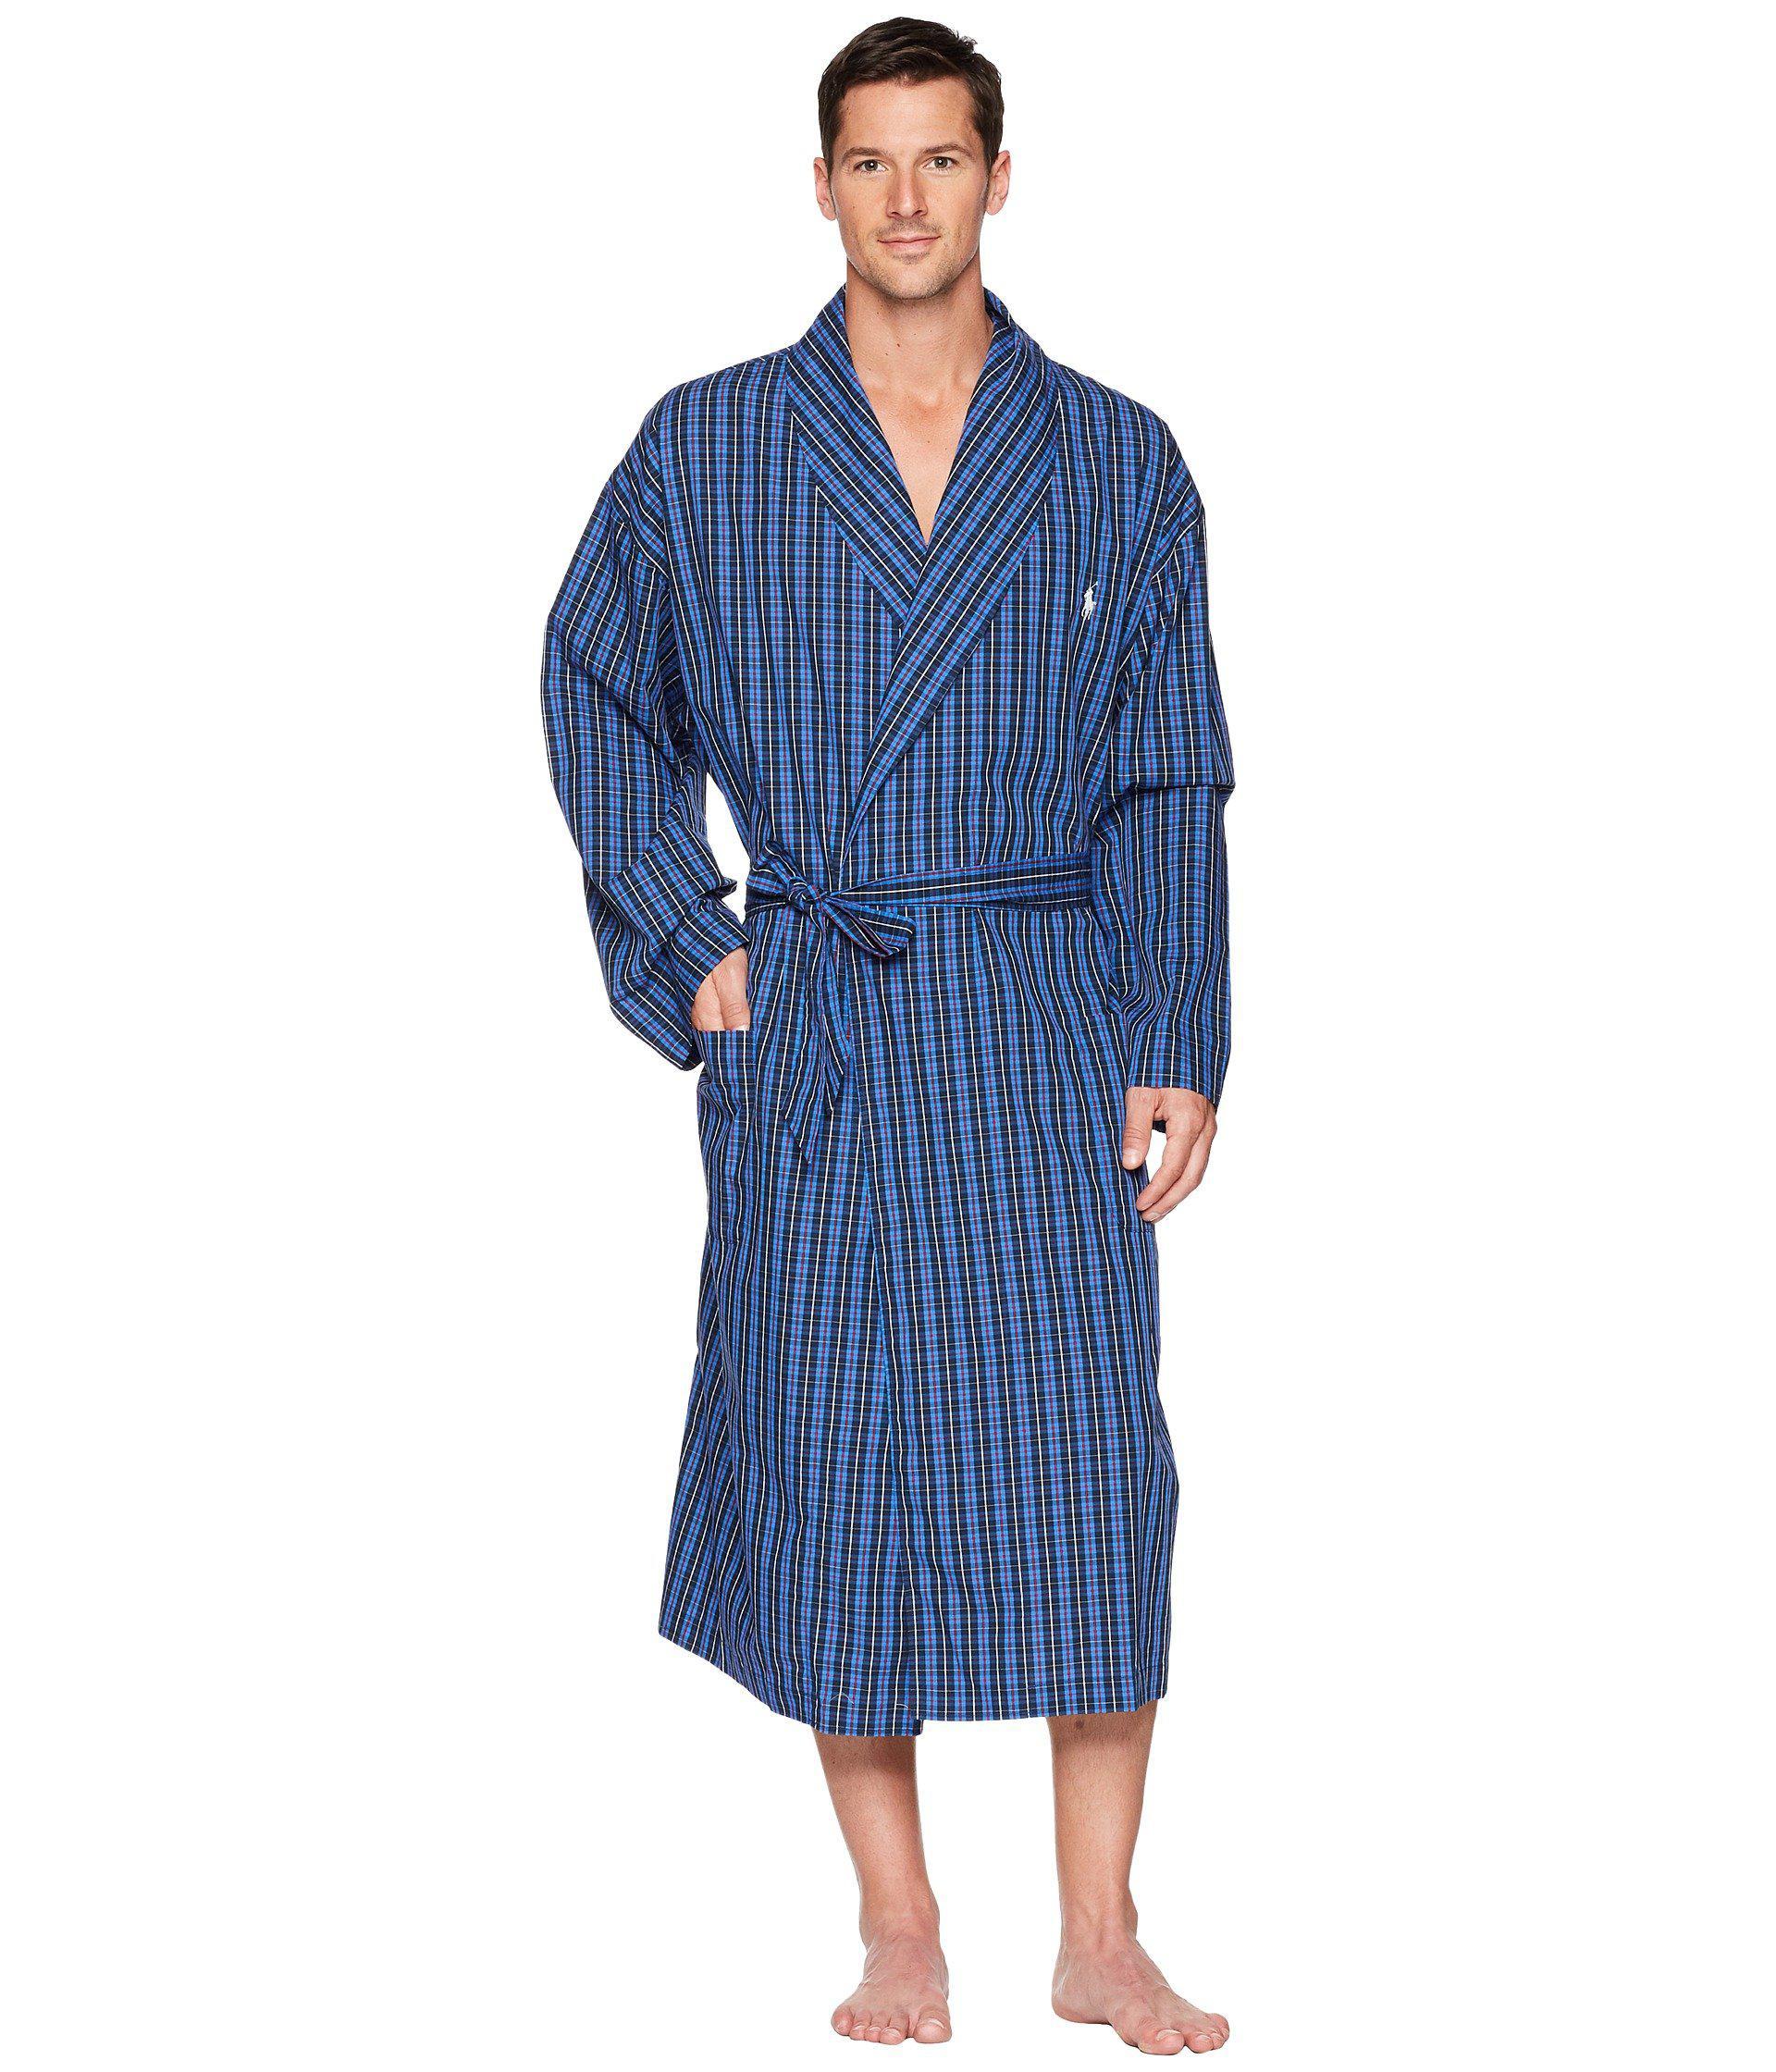 94aed4f2fc Lyst - Polo Ralph Lauren Woven Robe (harwick Plaid) Men s Robe in ...